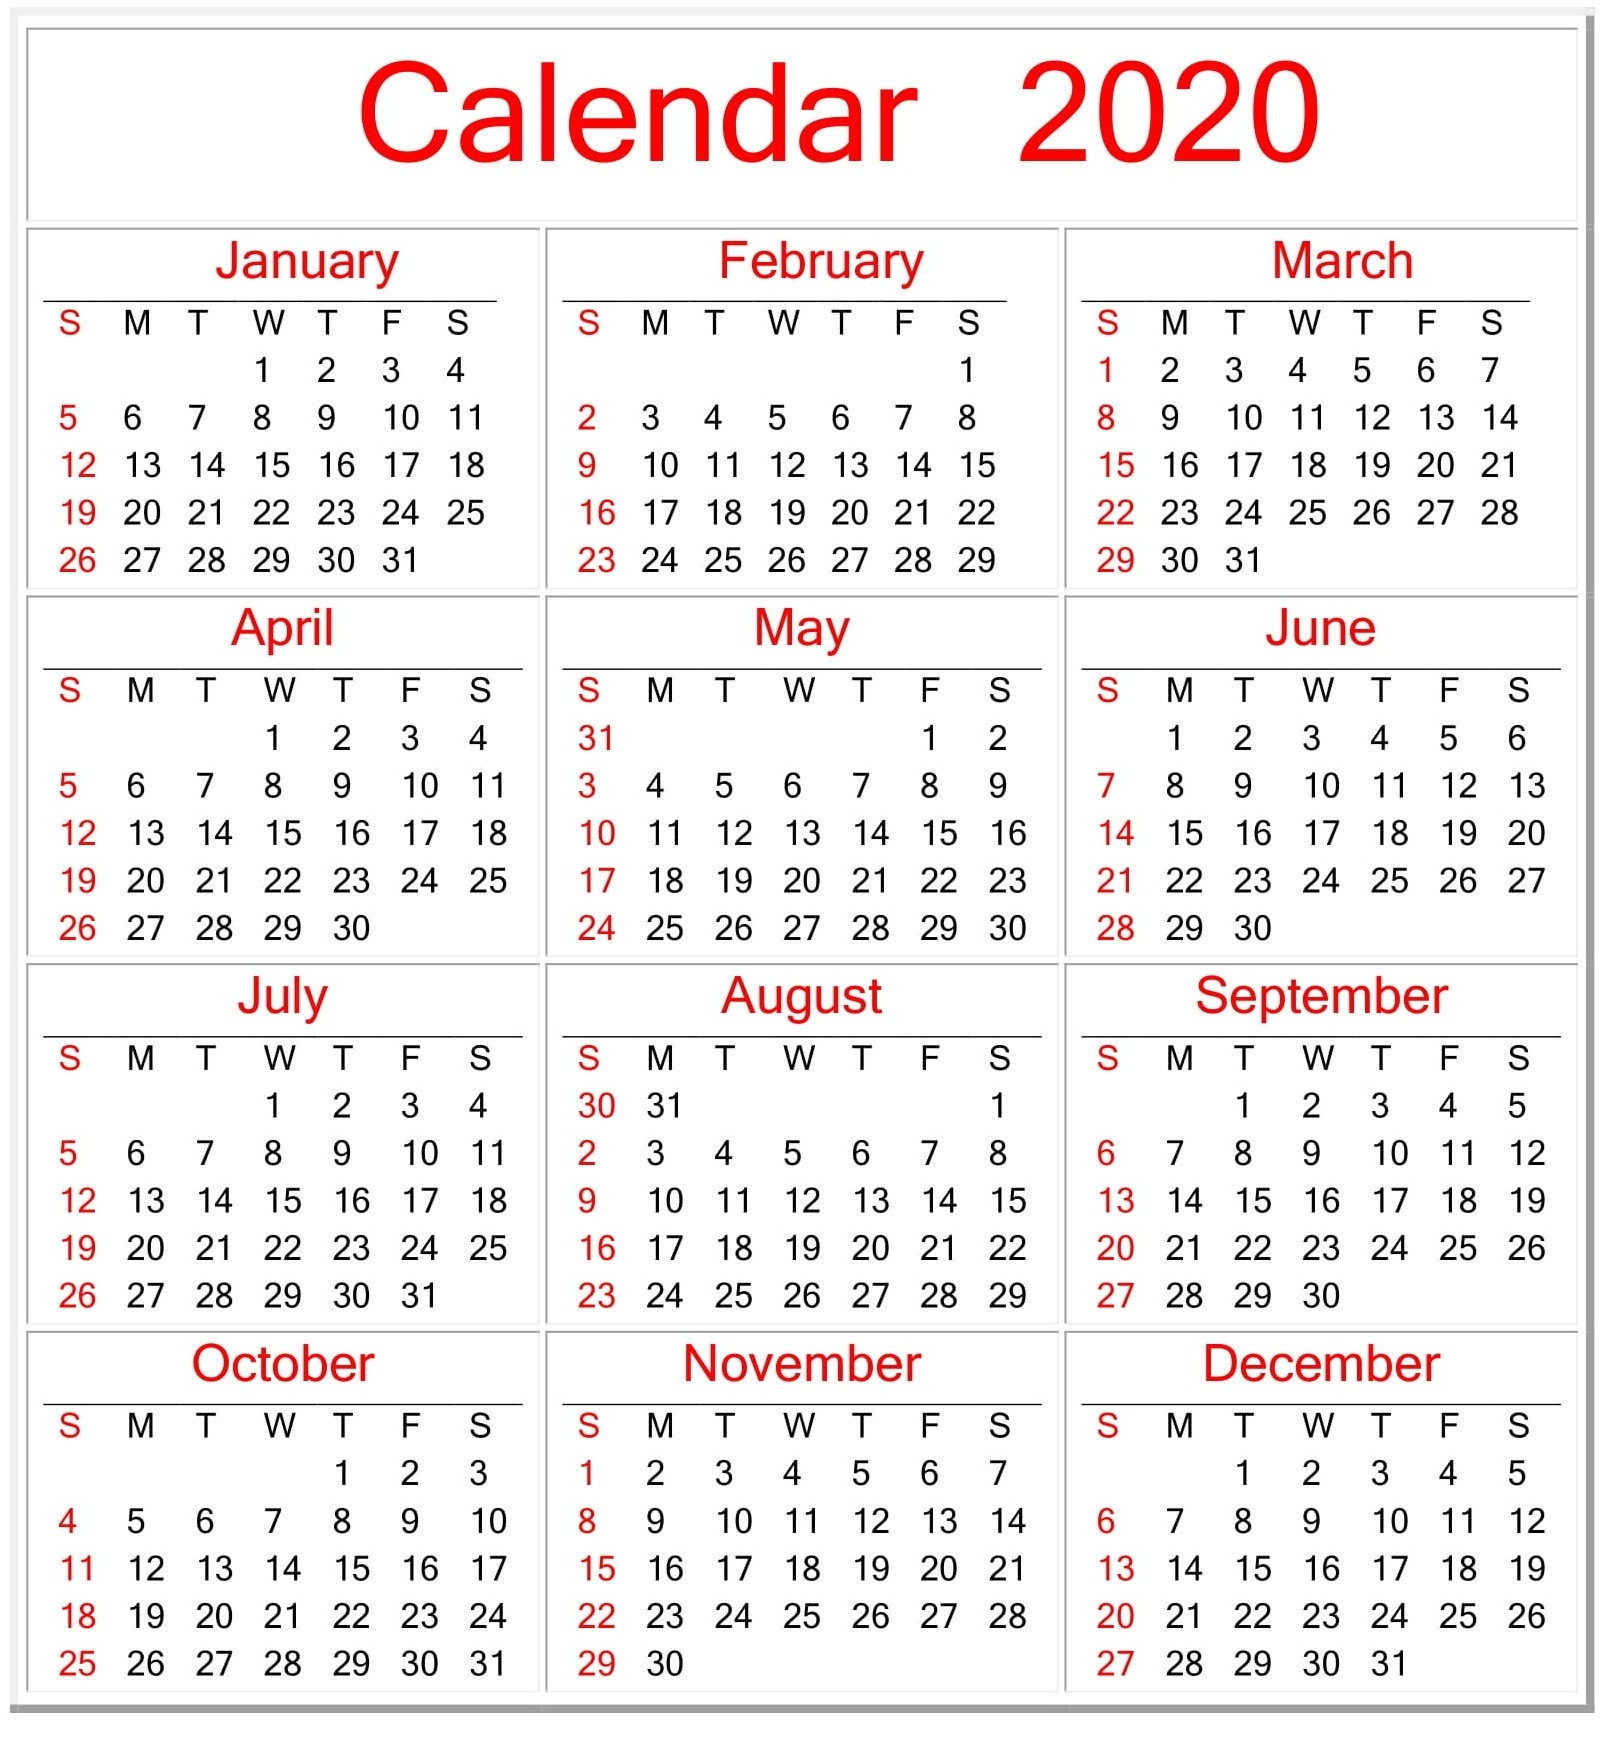 Free Printable Pocket Calendars 2020 | Calendar Template Printable Monthly Yearly-Pocket Calendar Free Online